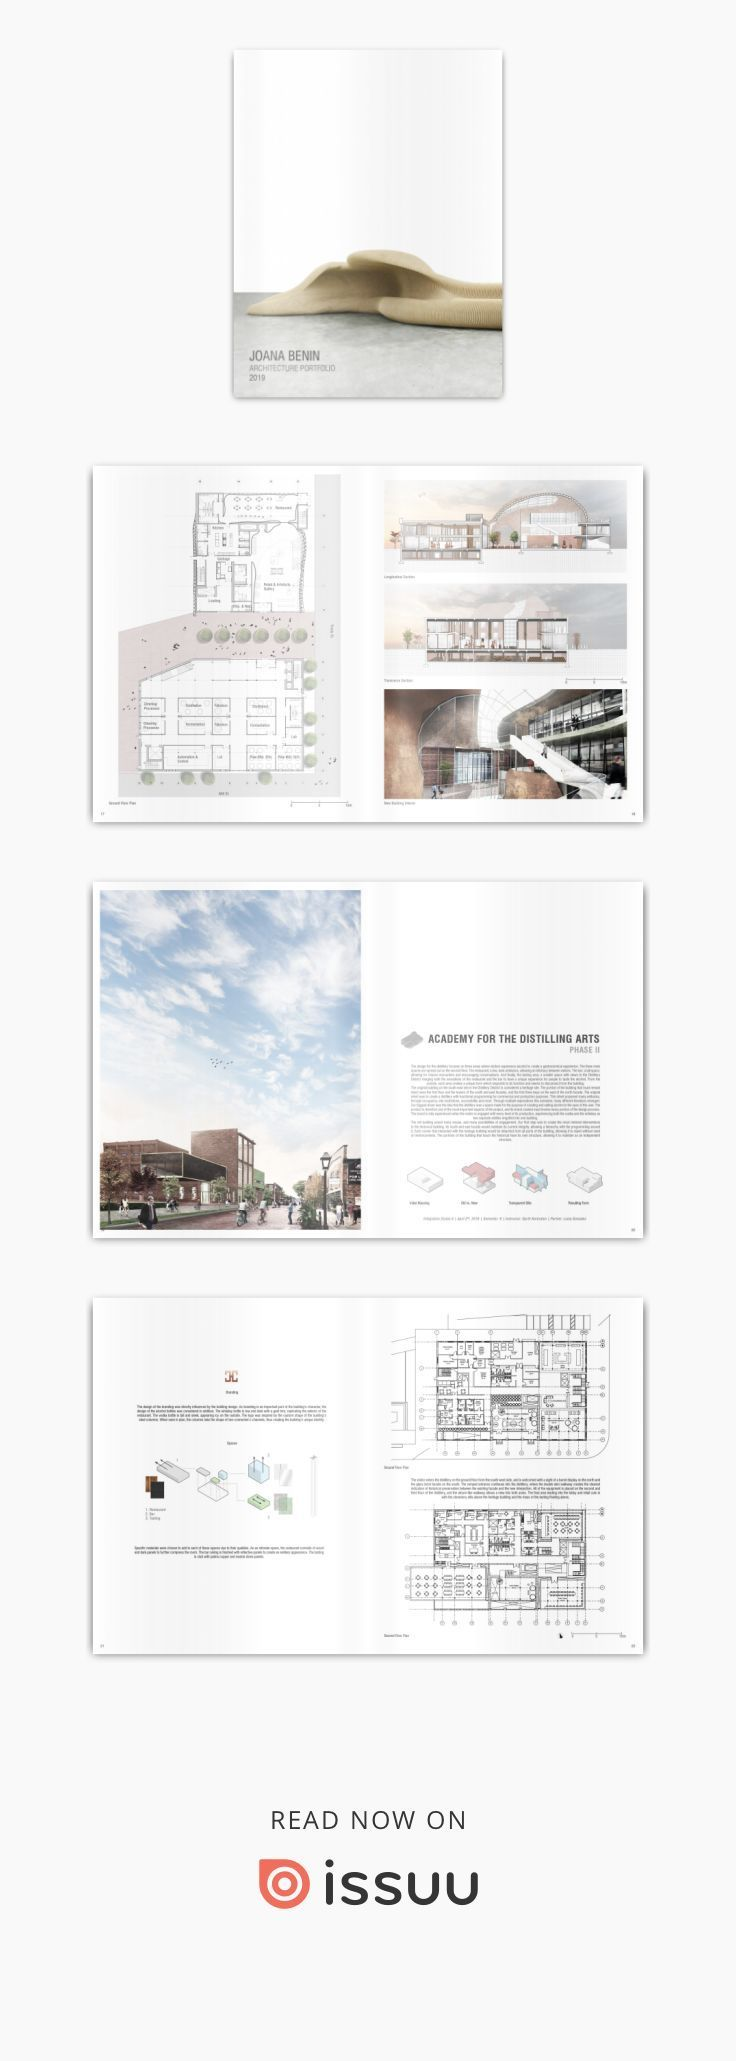 Joana Benin In 2020 Architecture Portfolio Layout Architecture Portfolio Examples Portfolio Cover Design